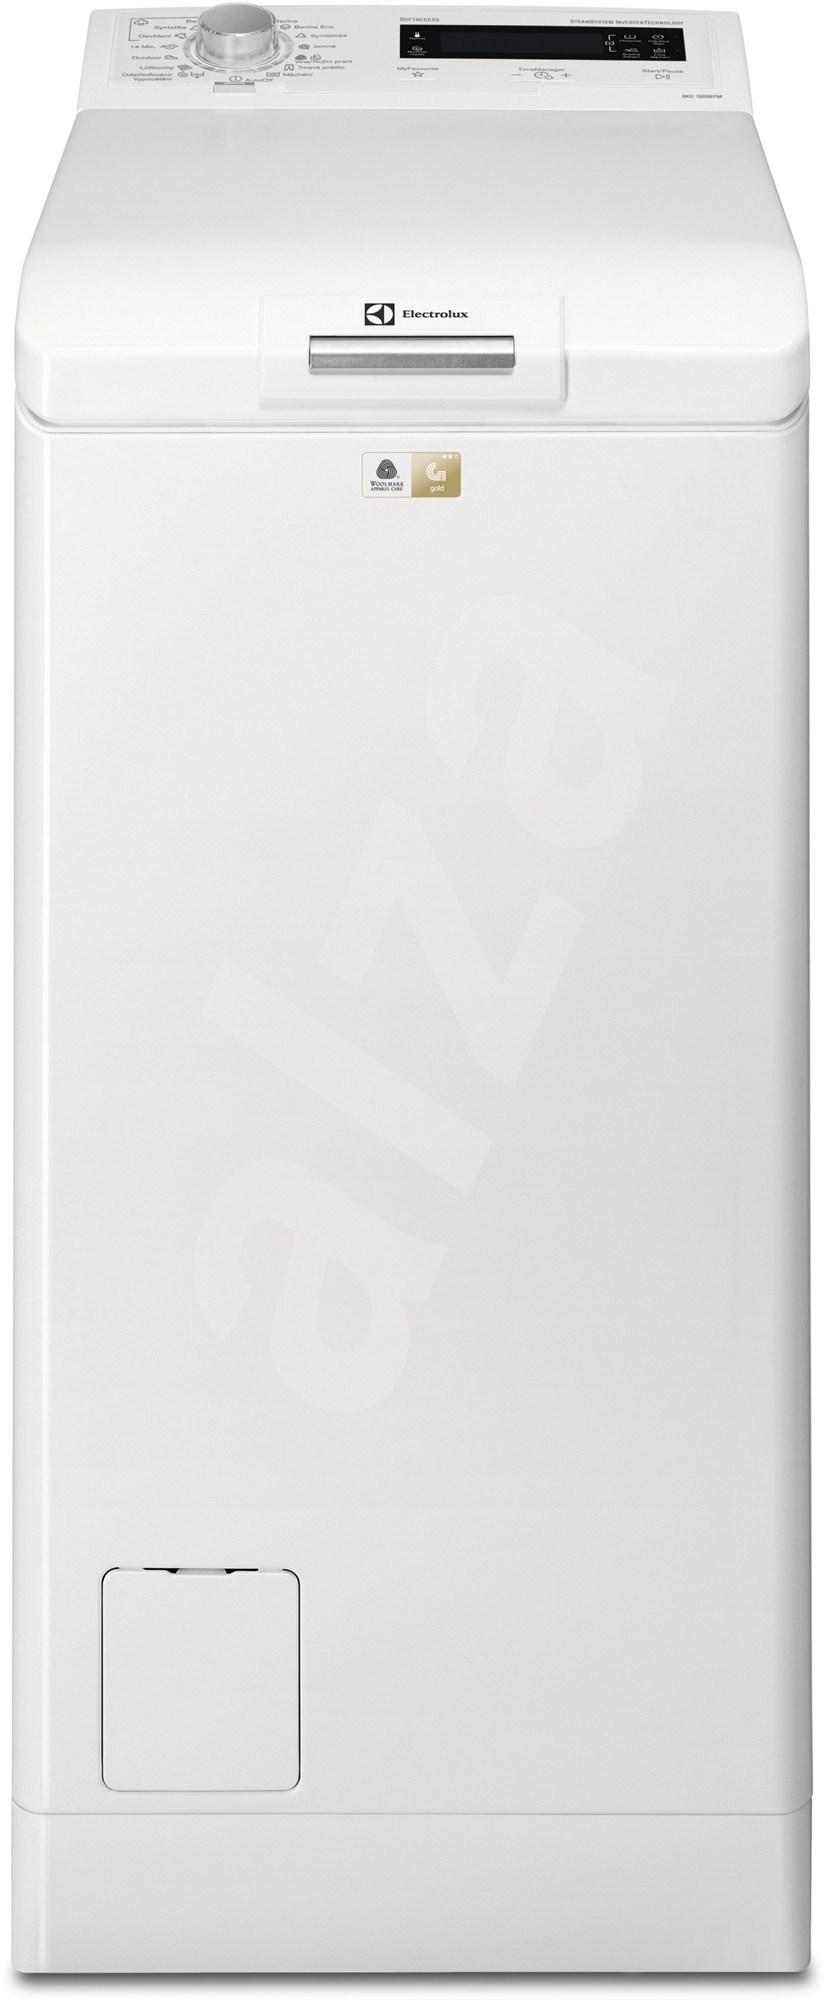 Electrolux EWT 1367 VDW